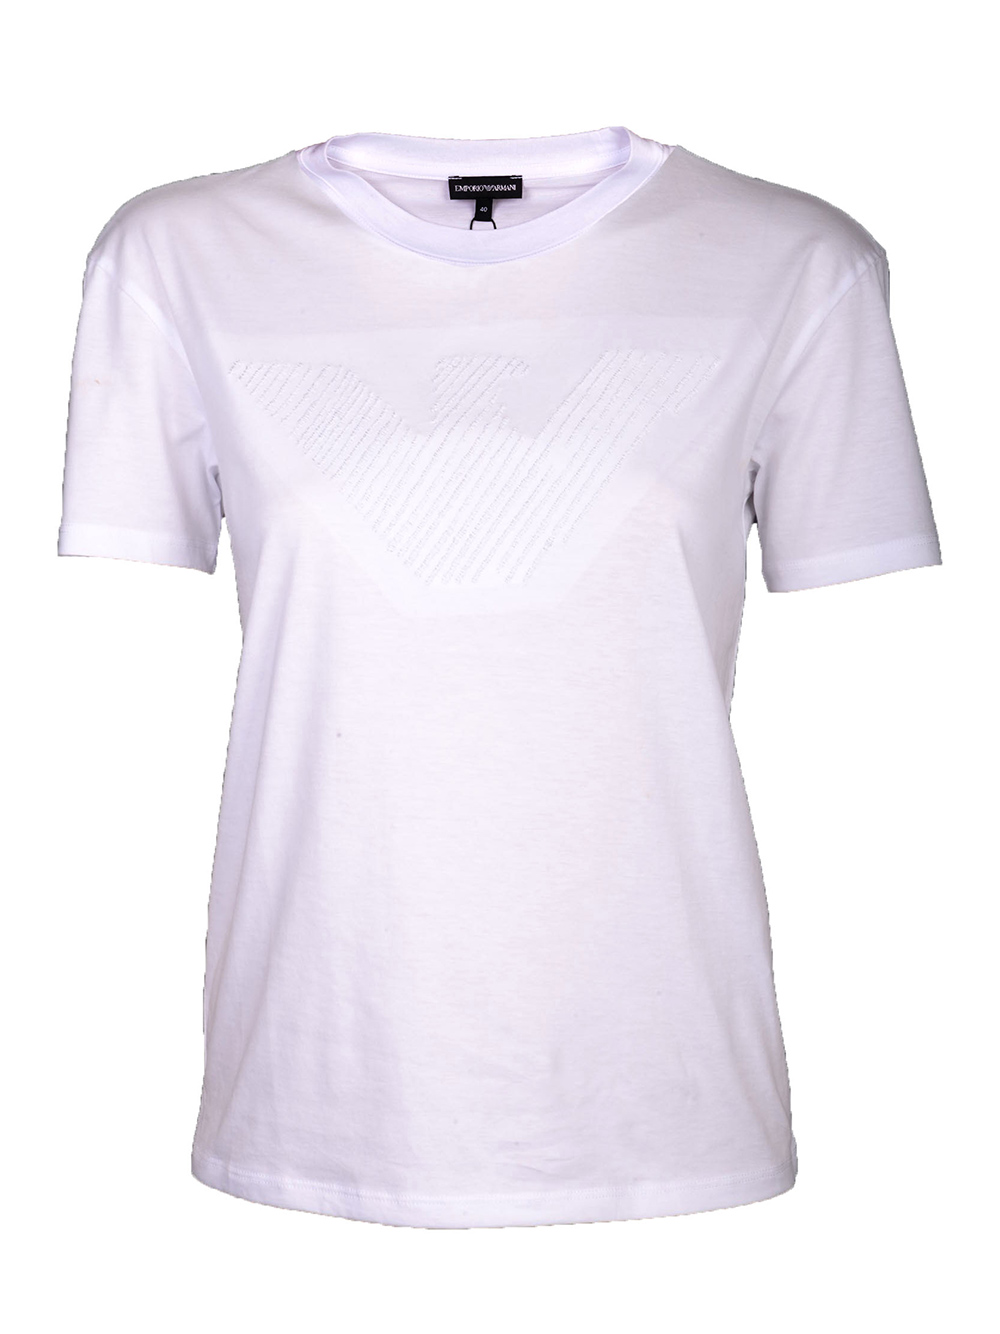 EMPORIO ARMANI Μπλούζα Τ-shirt 3G2T88 2JSYZ ΛΕΥΚΟ